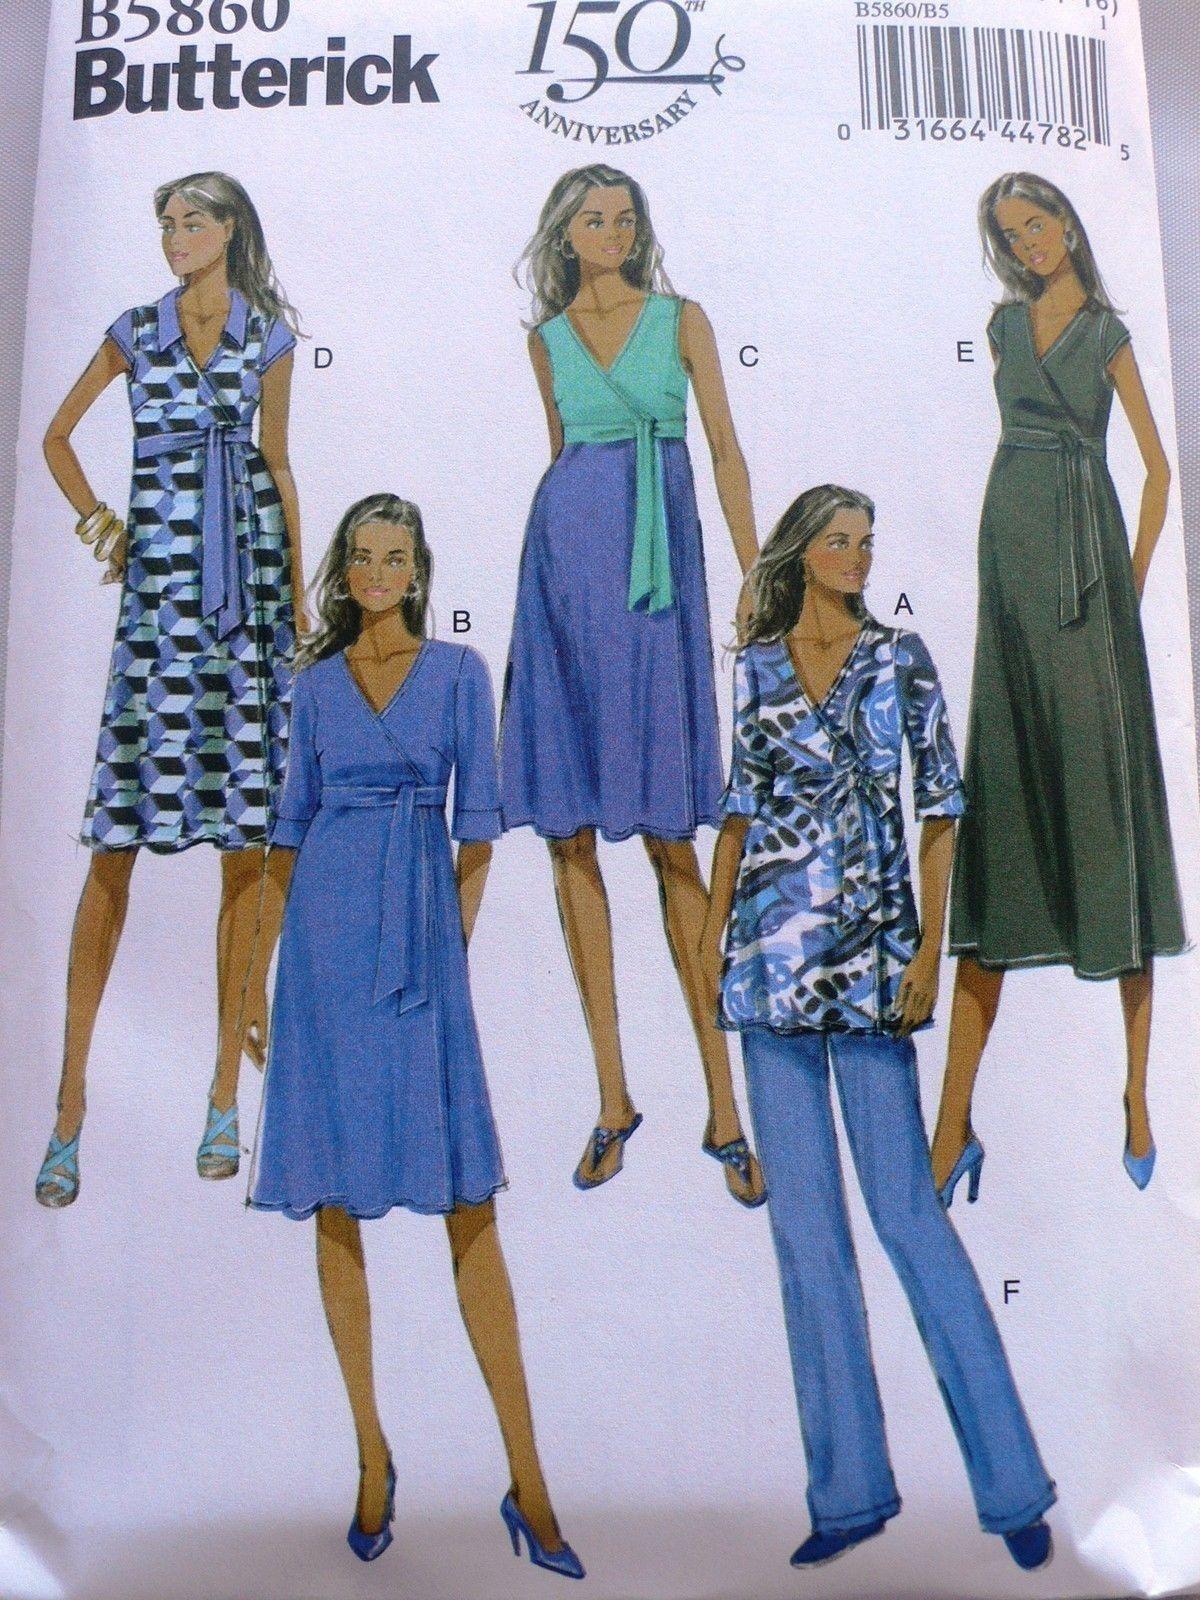 Butterick 5860 miss women maternity wrap dress top pants pattern butterick 5860 miss women maternity wrap dress top pants pattern plus size 16 24 jeuxipadfo Choice Image